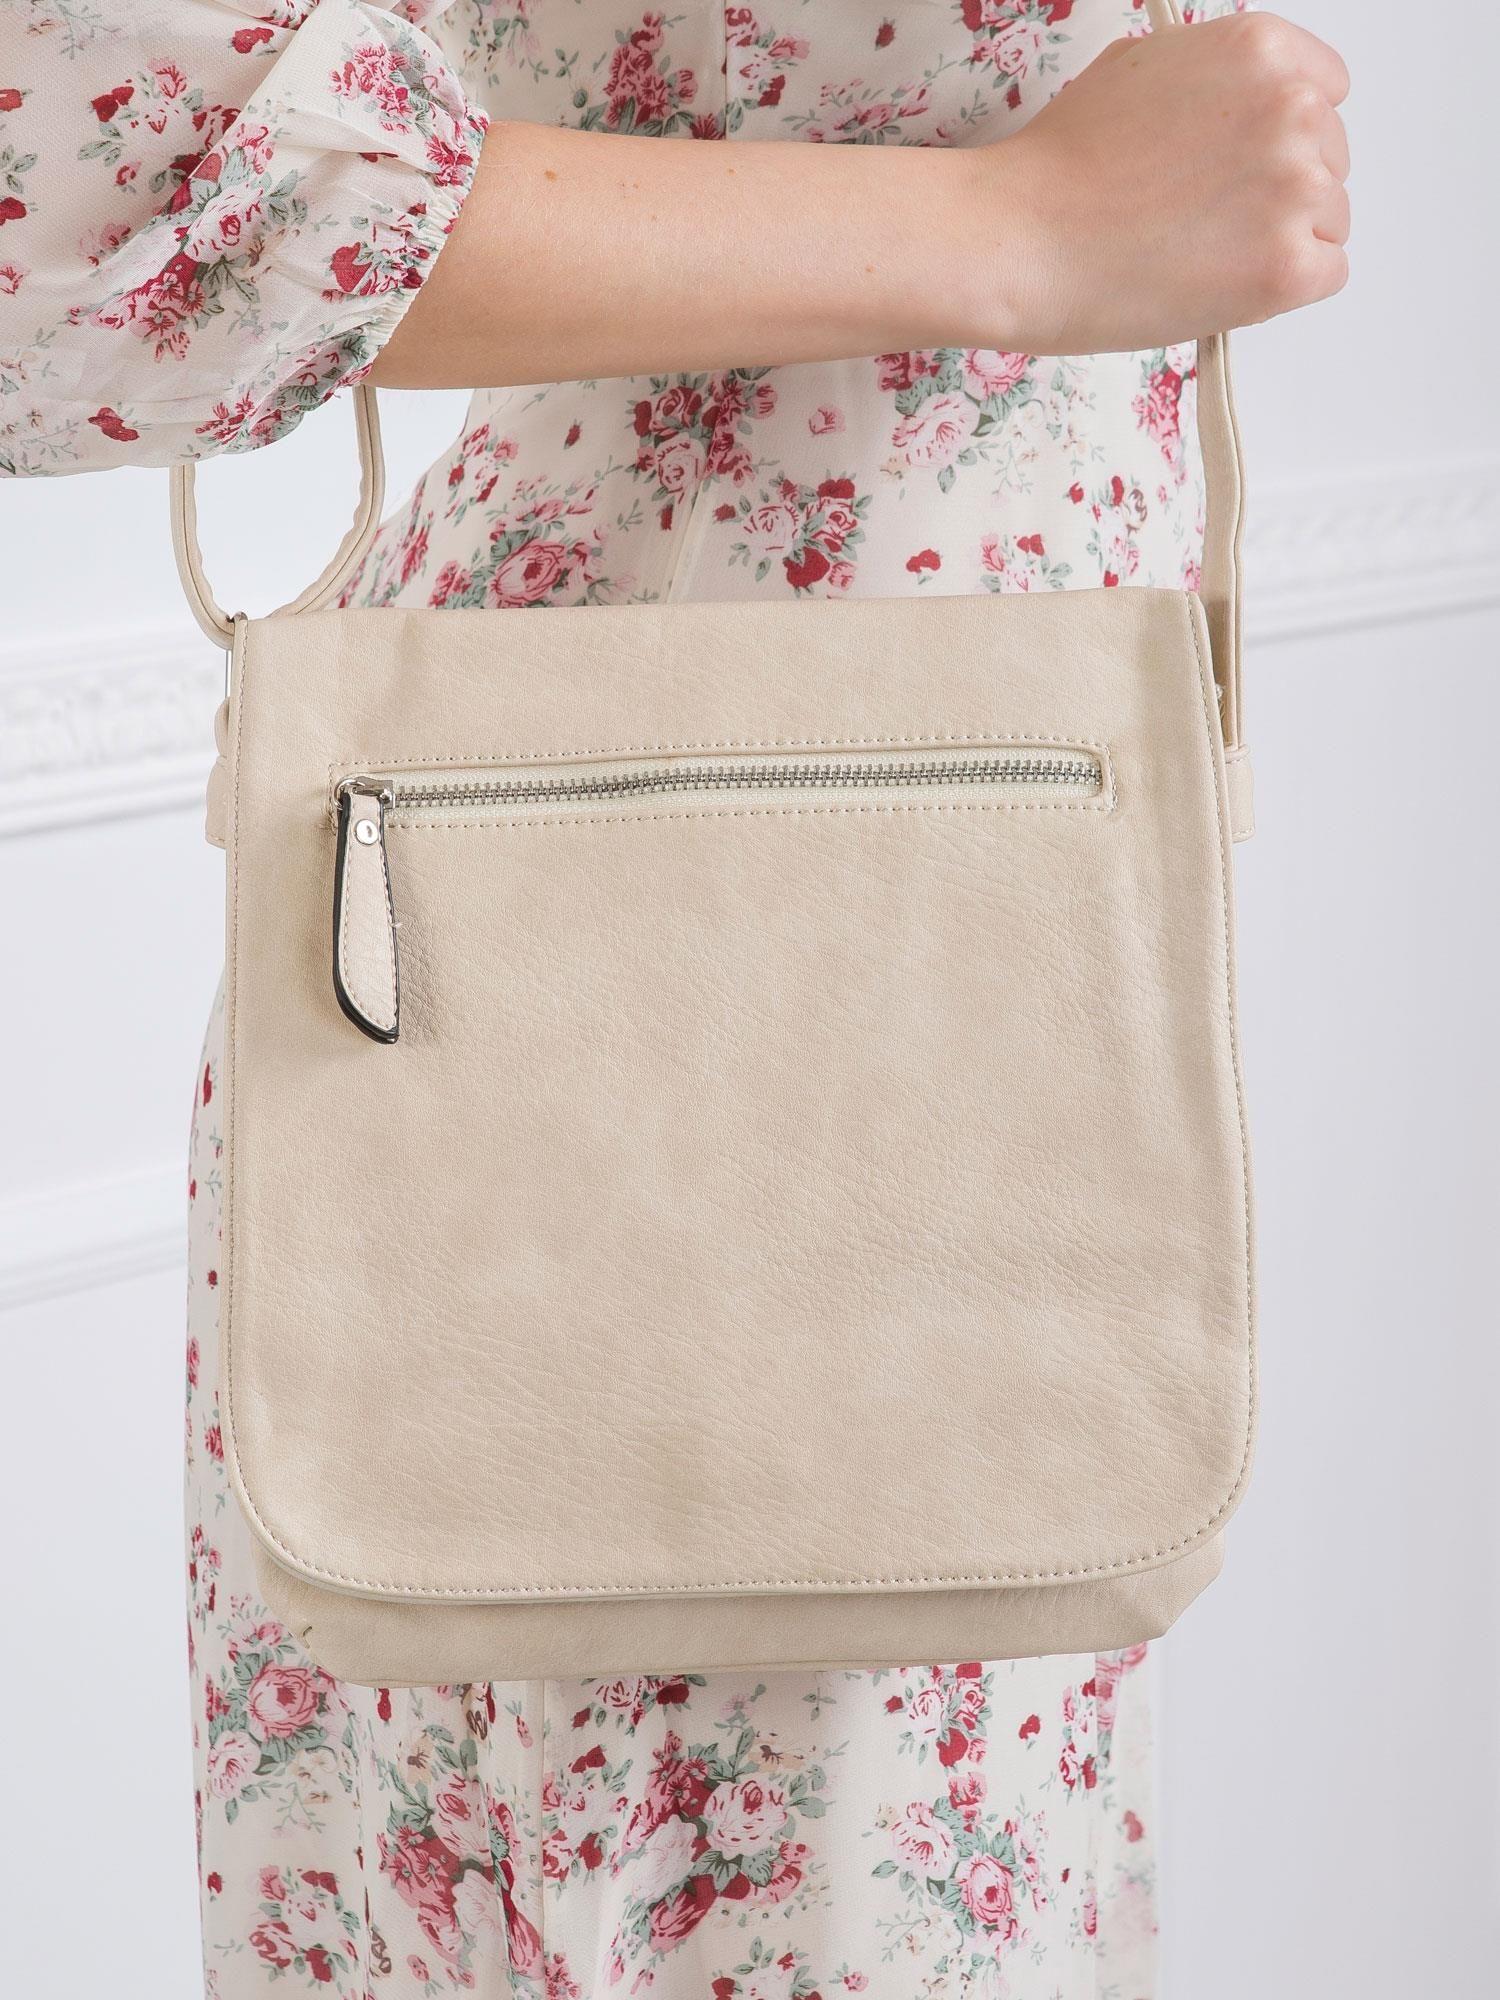 Dámska béžová kabelka s dlhým remienkom - UNI